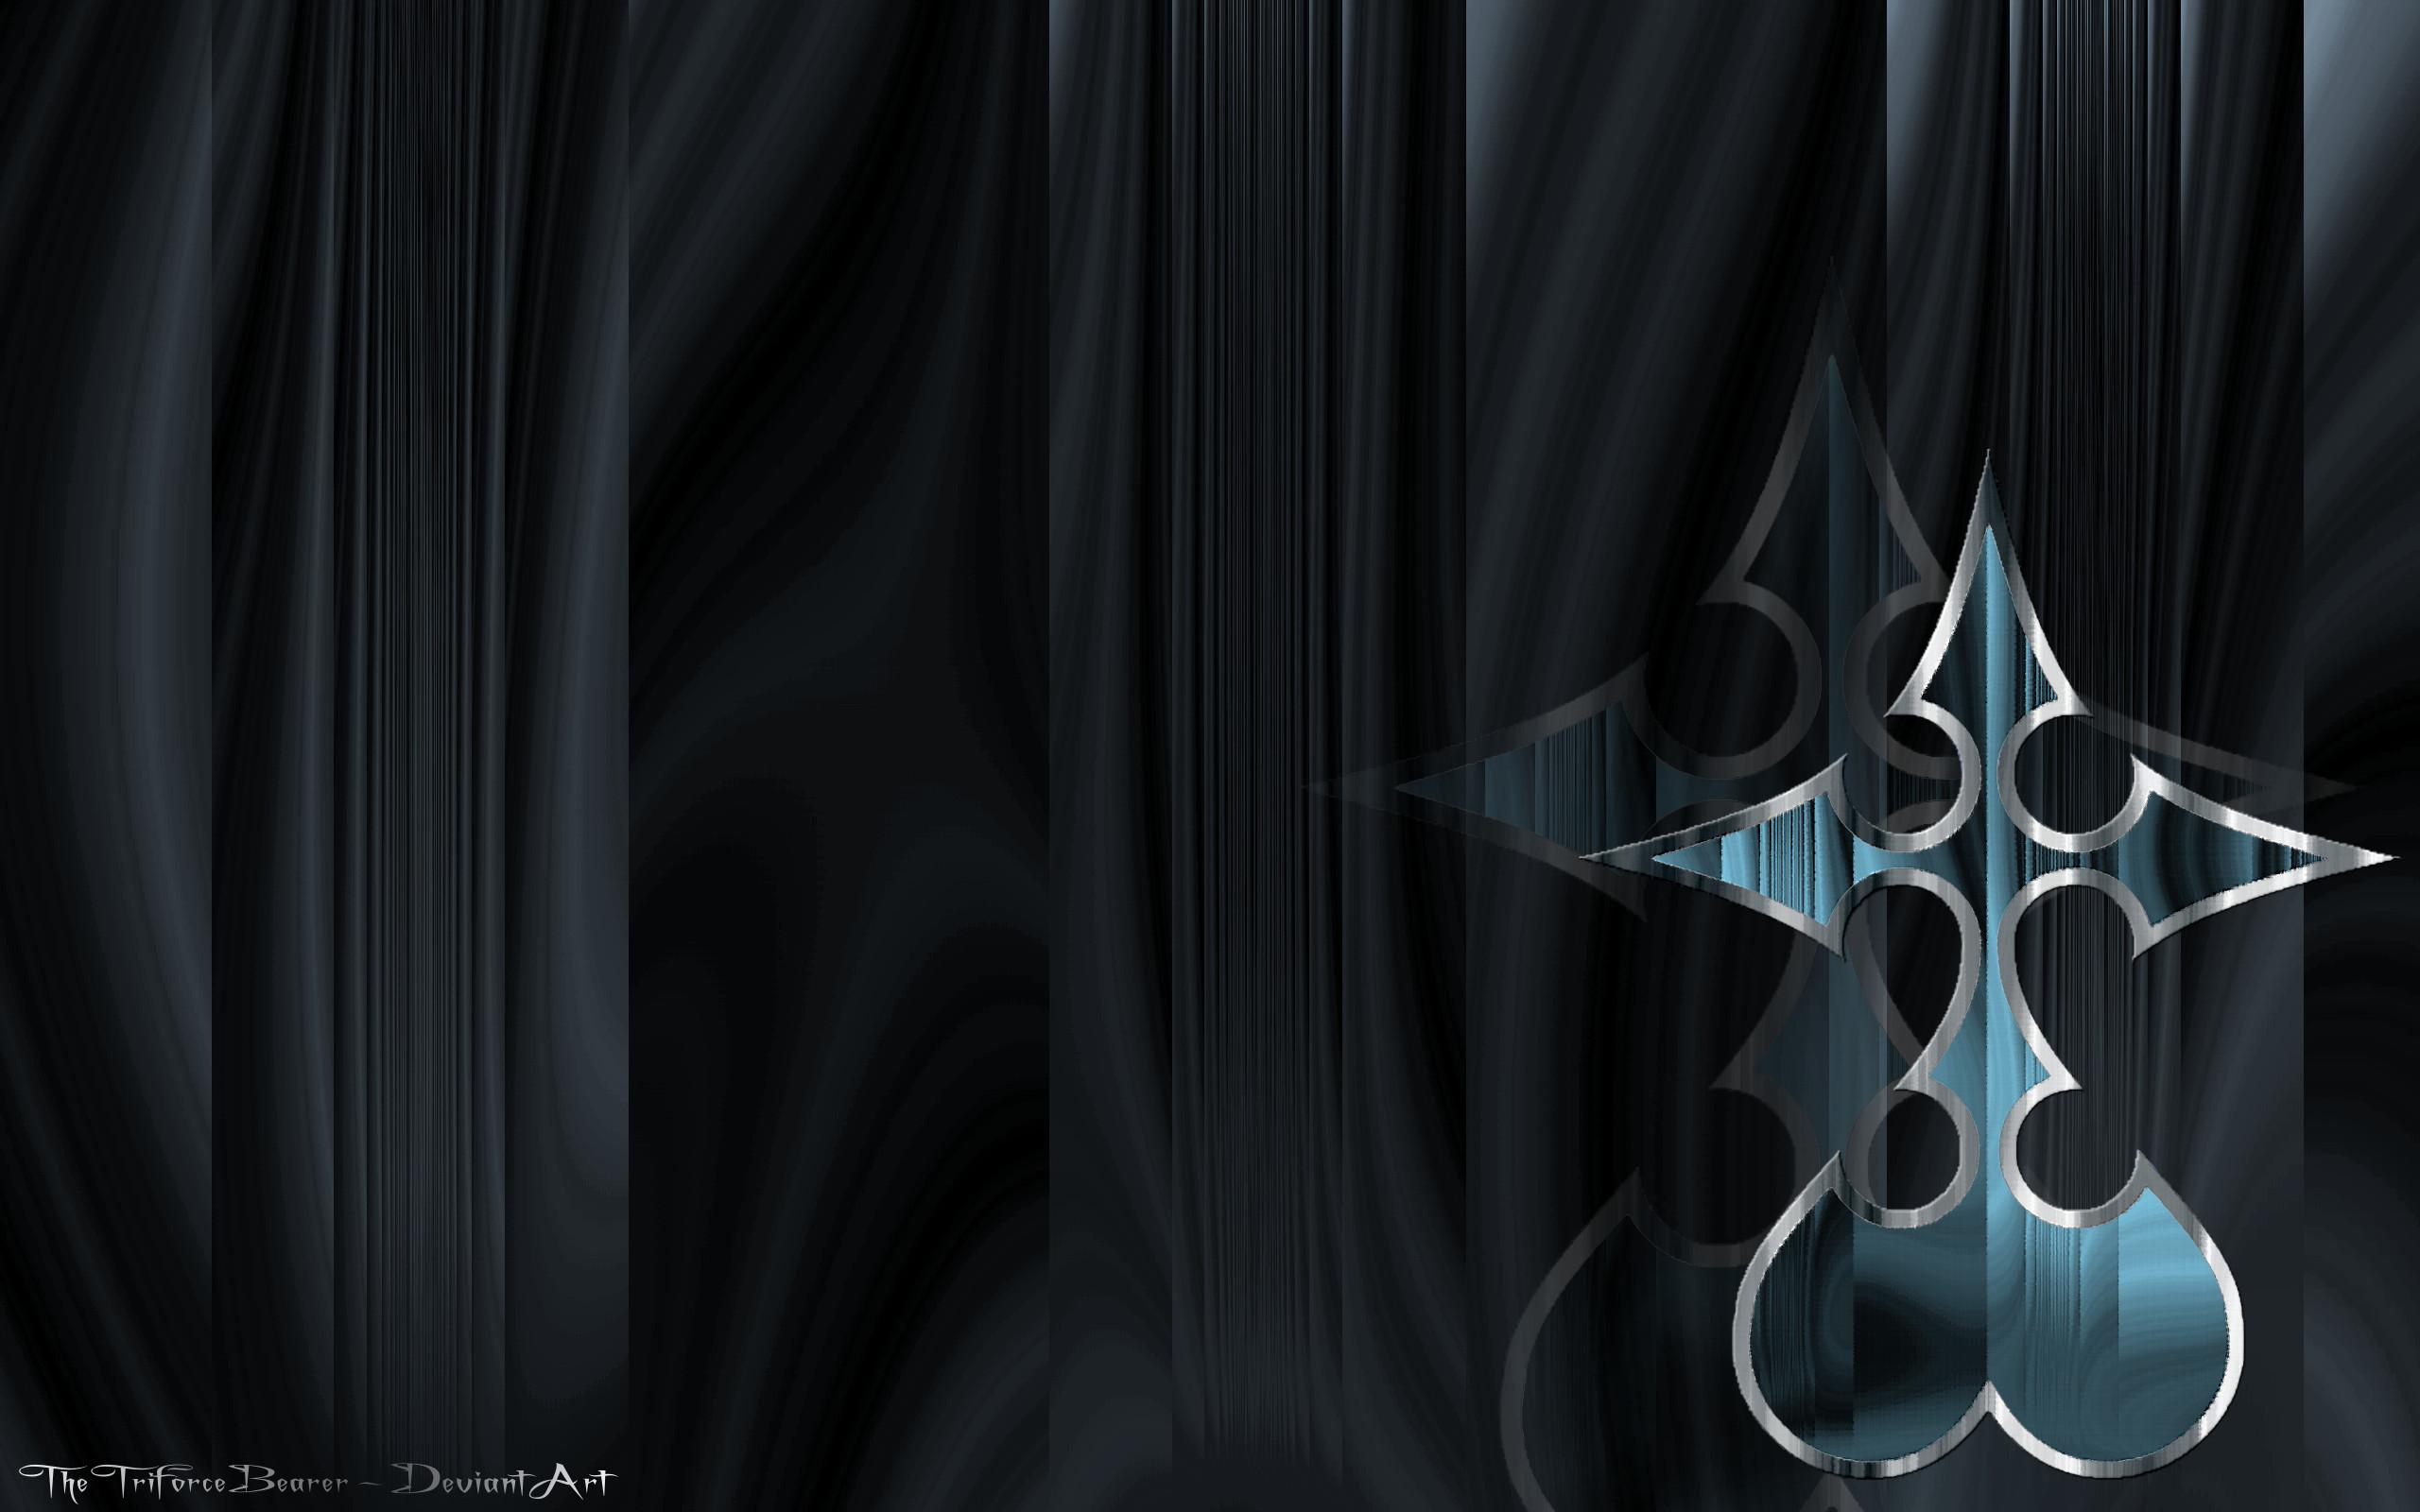 Kingdom Hearts Organization 13 Wallpaper Organization xiii wallpaperKingdom Hearts Organization 13 Wallpaper